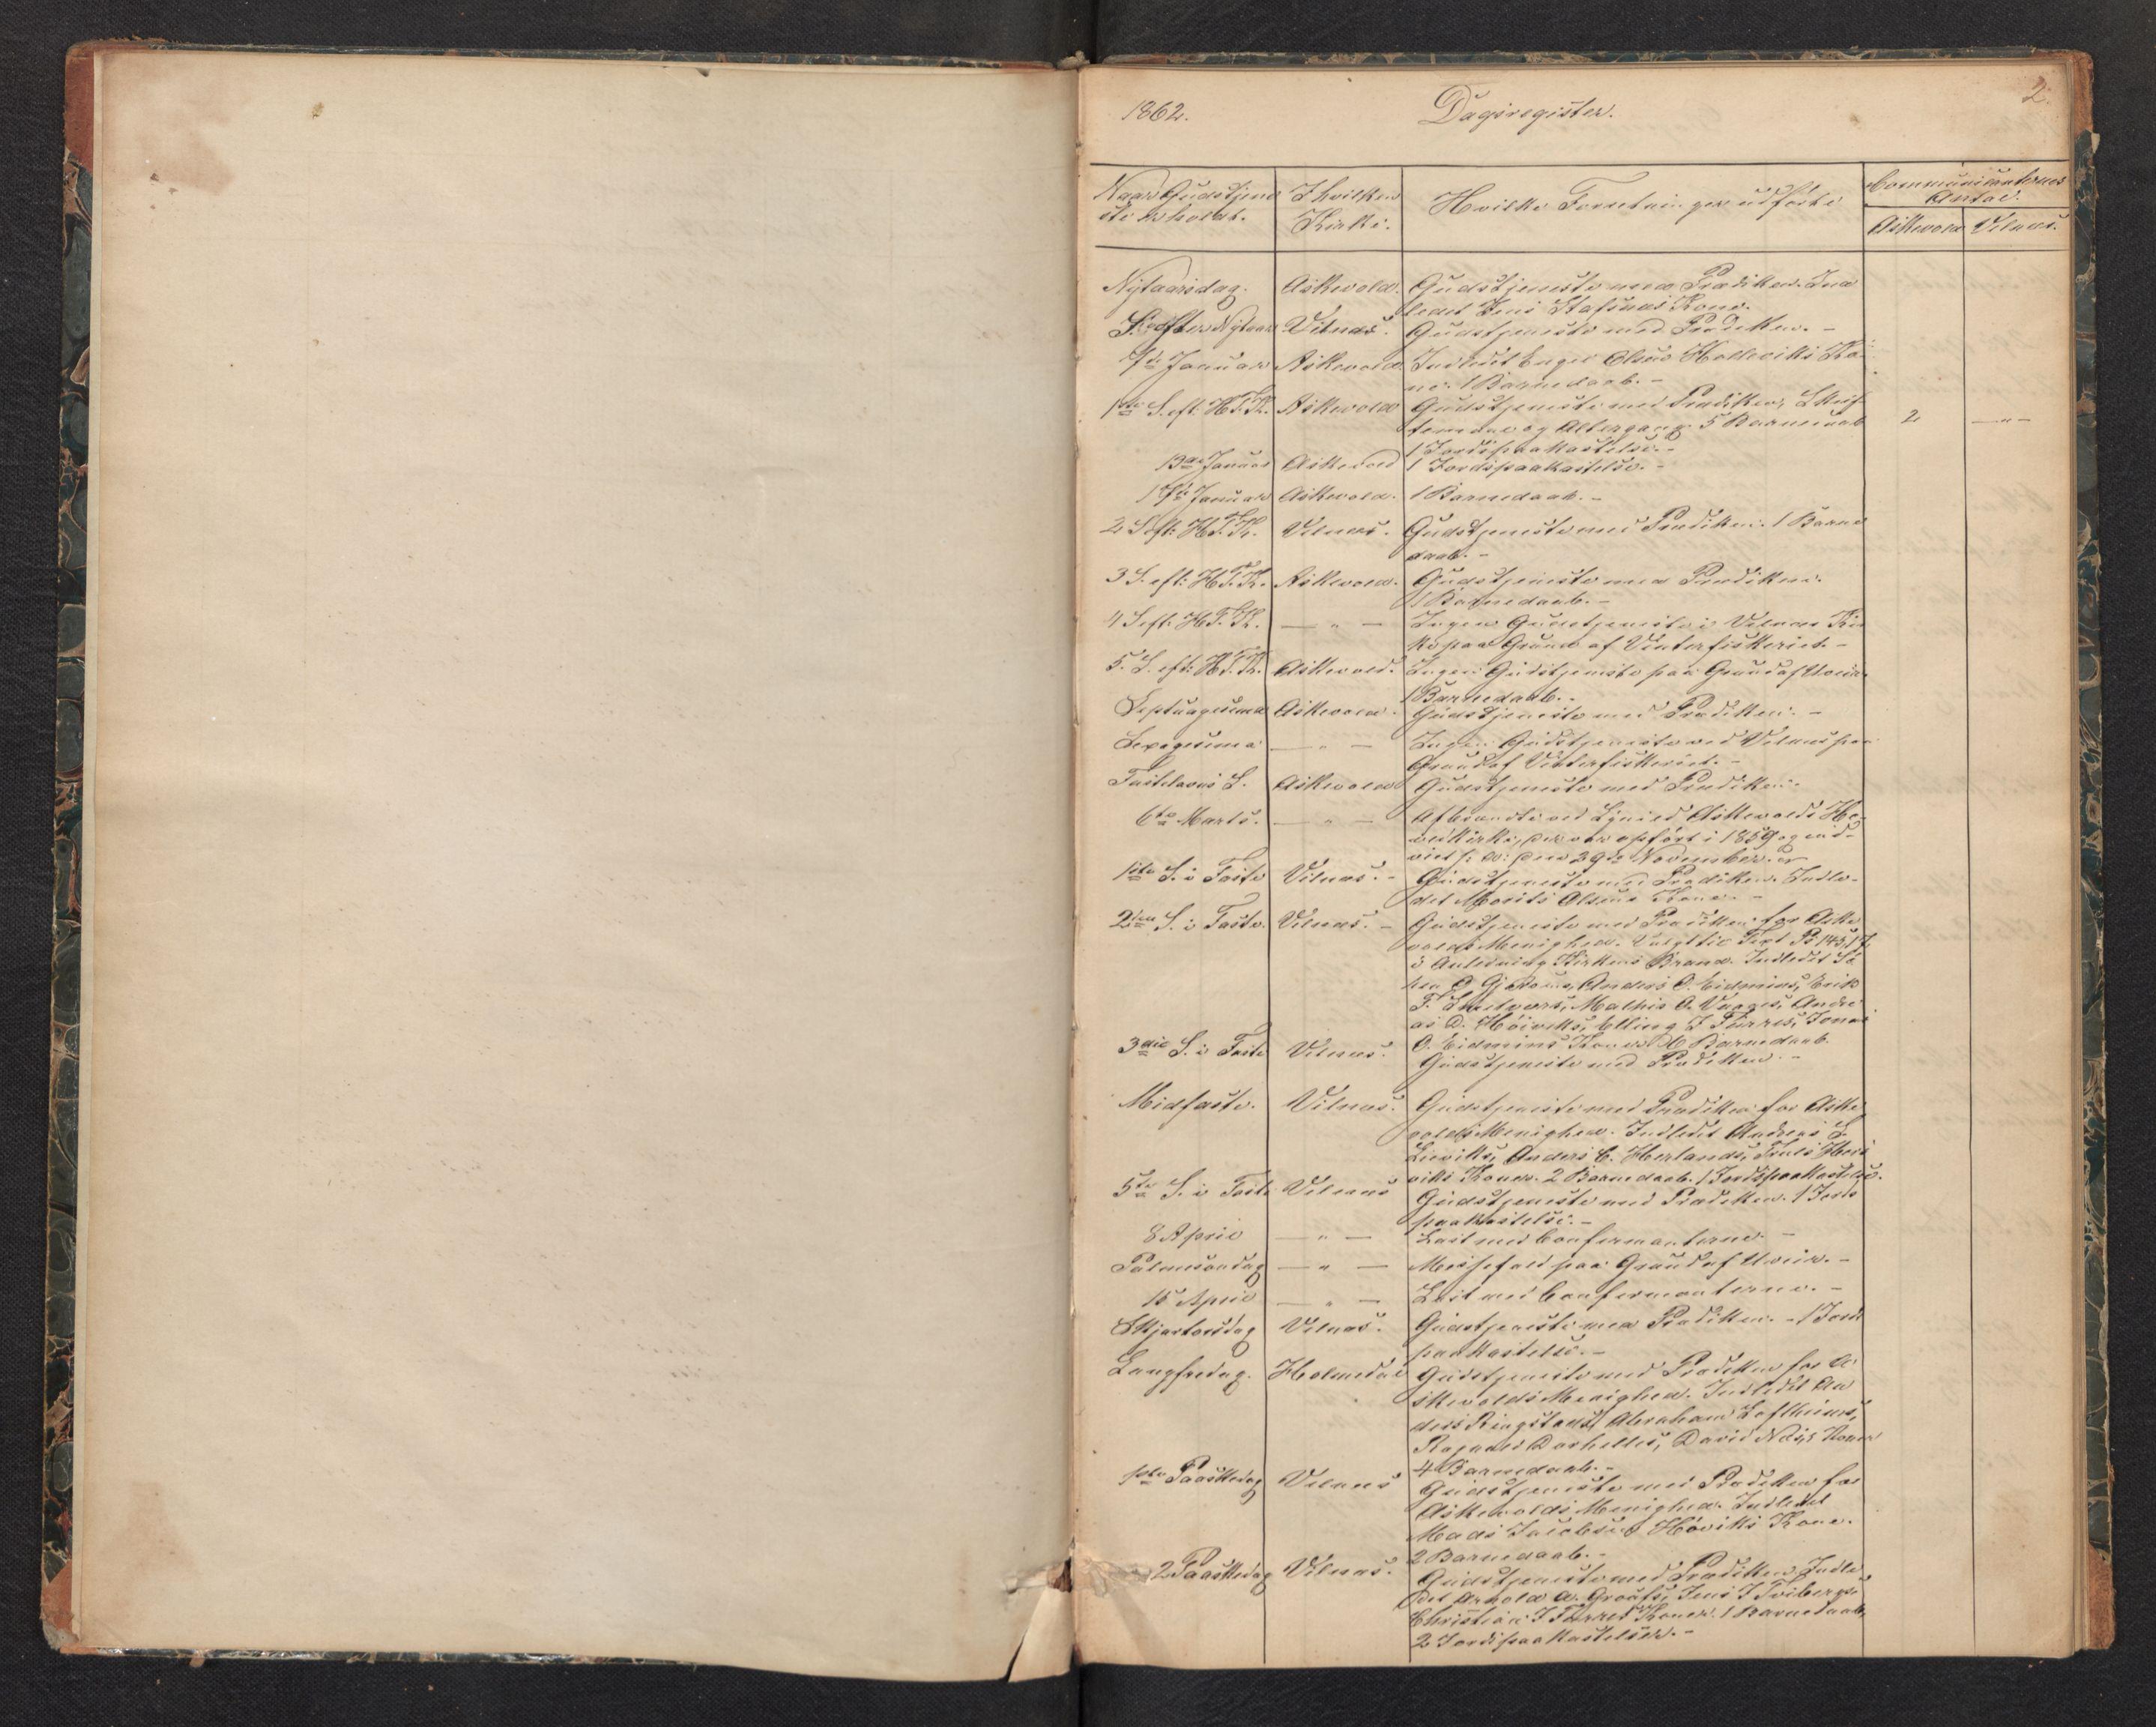 SAB, Askvoll Sokneprestembete, Dagregister nr. D 1, 1862-1878, s. 1b-2a